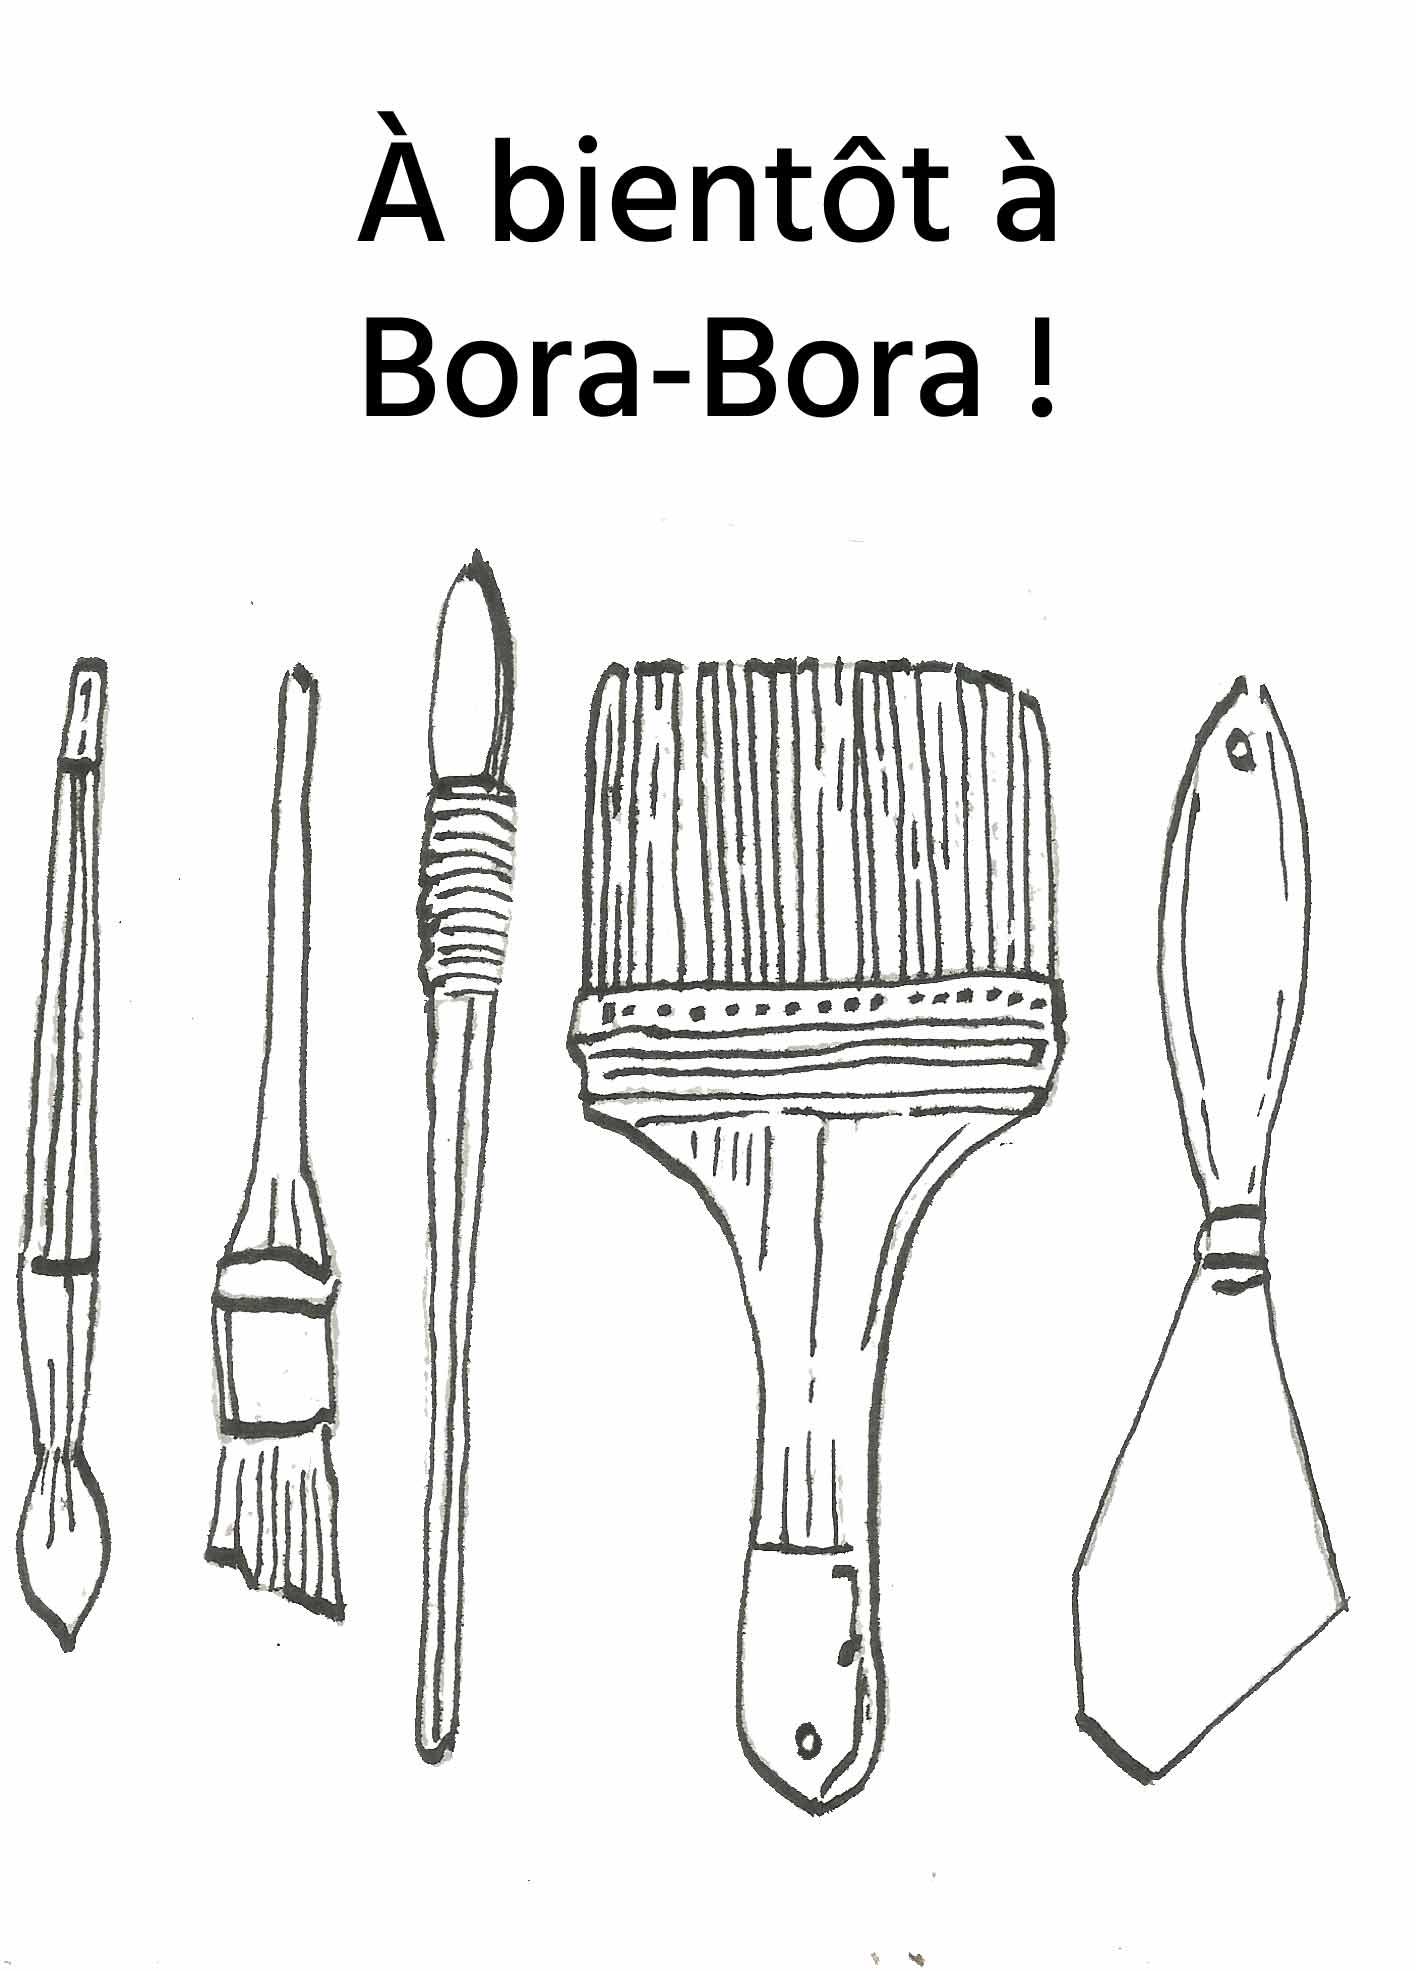 art artiste peintre bora bora polynésie française jean-pierre frey artist studio